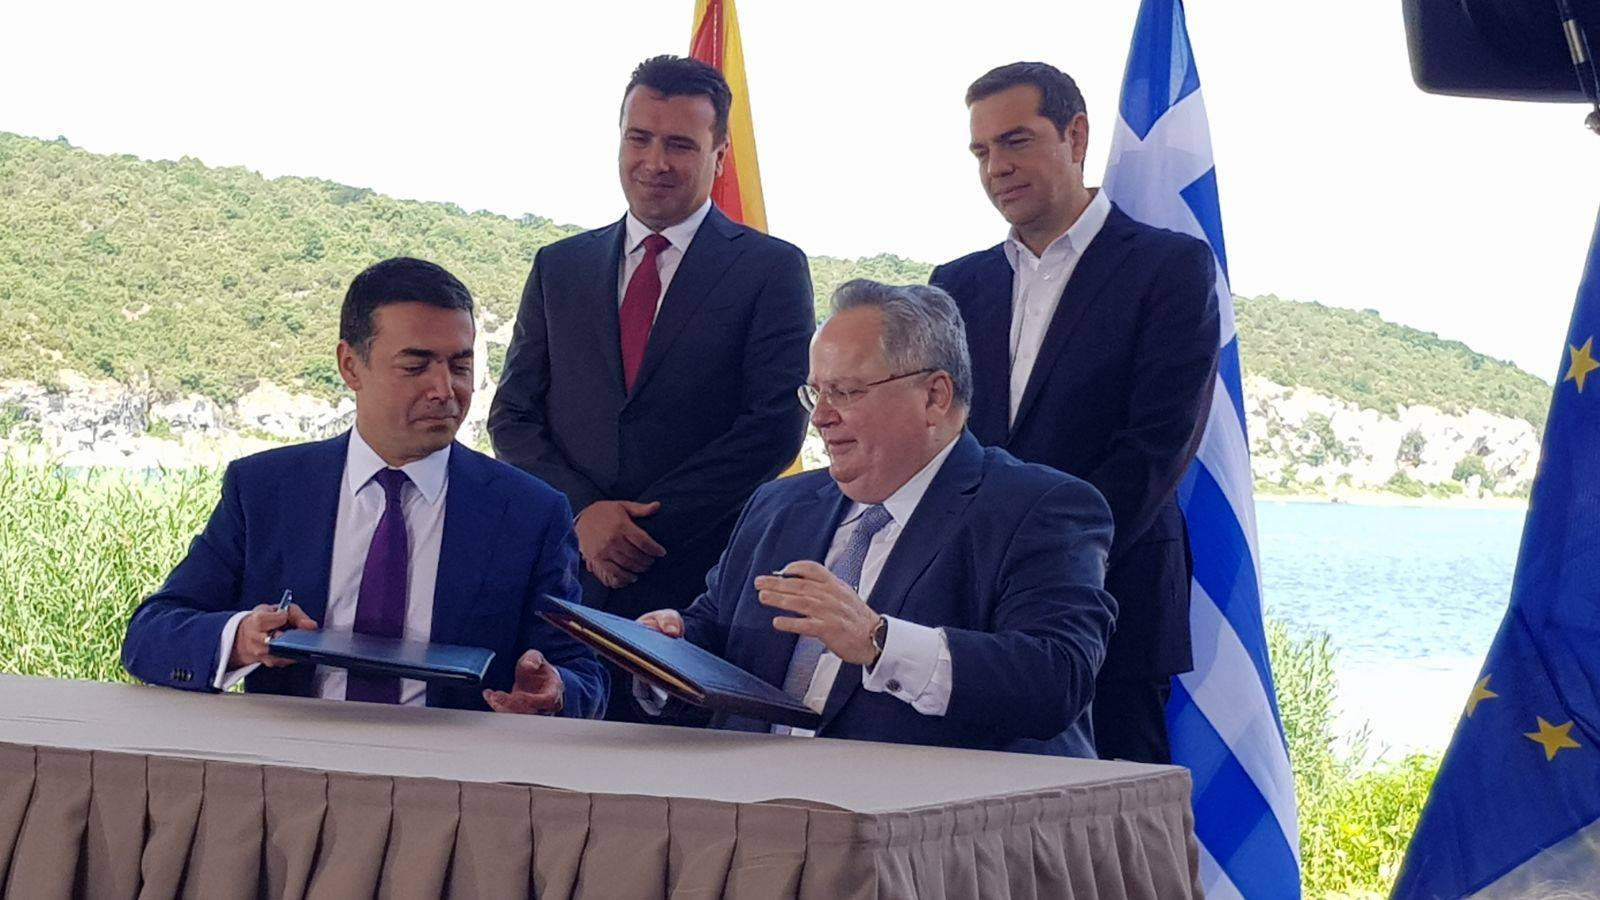 Prespa Agreement putting strain on Greek coalition